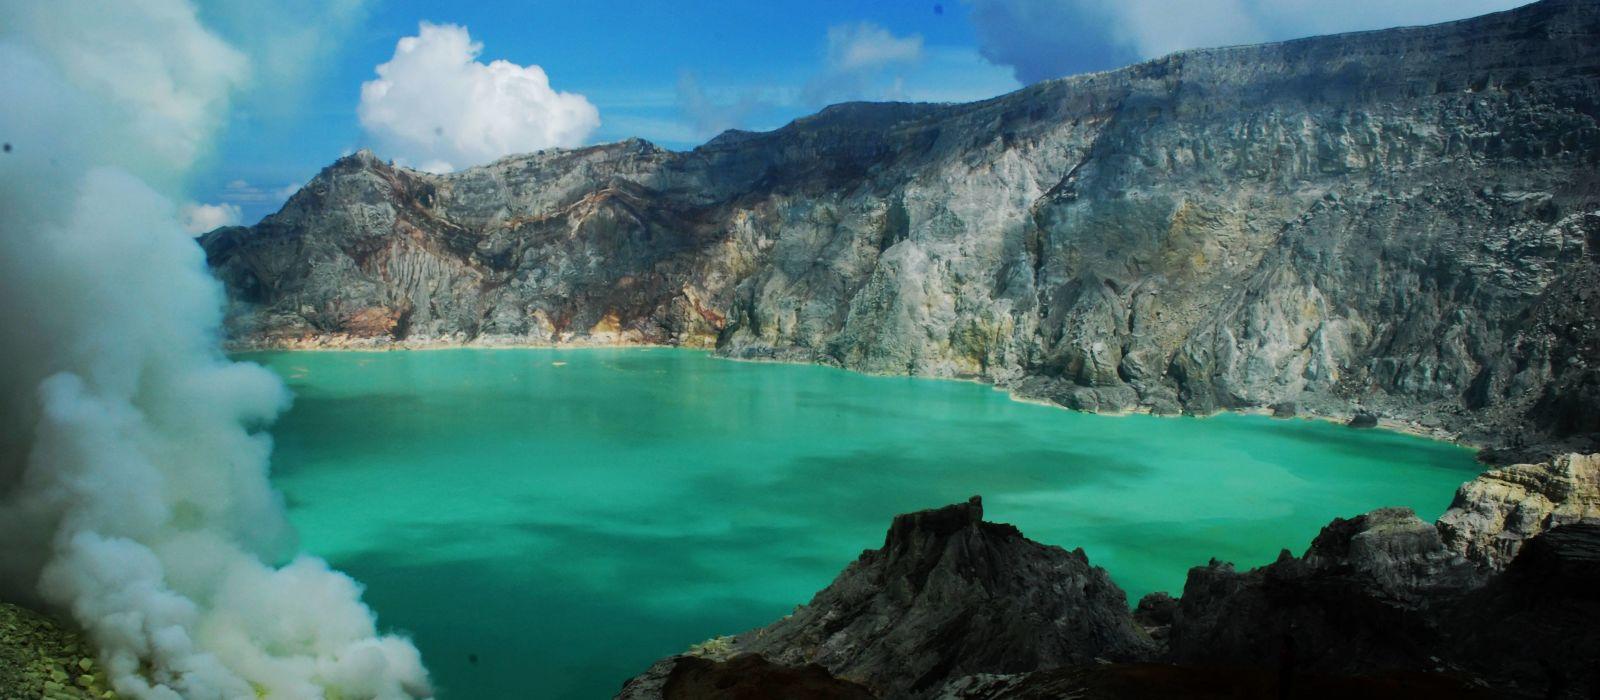 Destination Ijen Indonesia